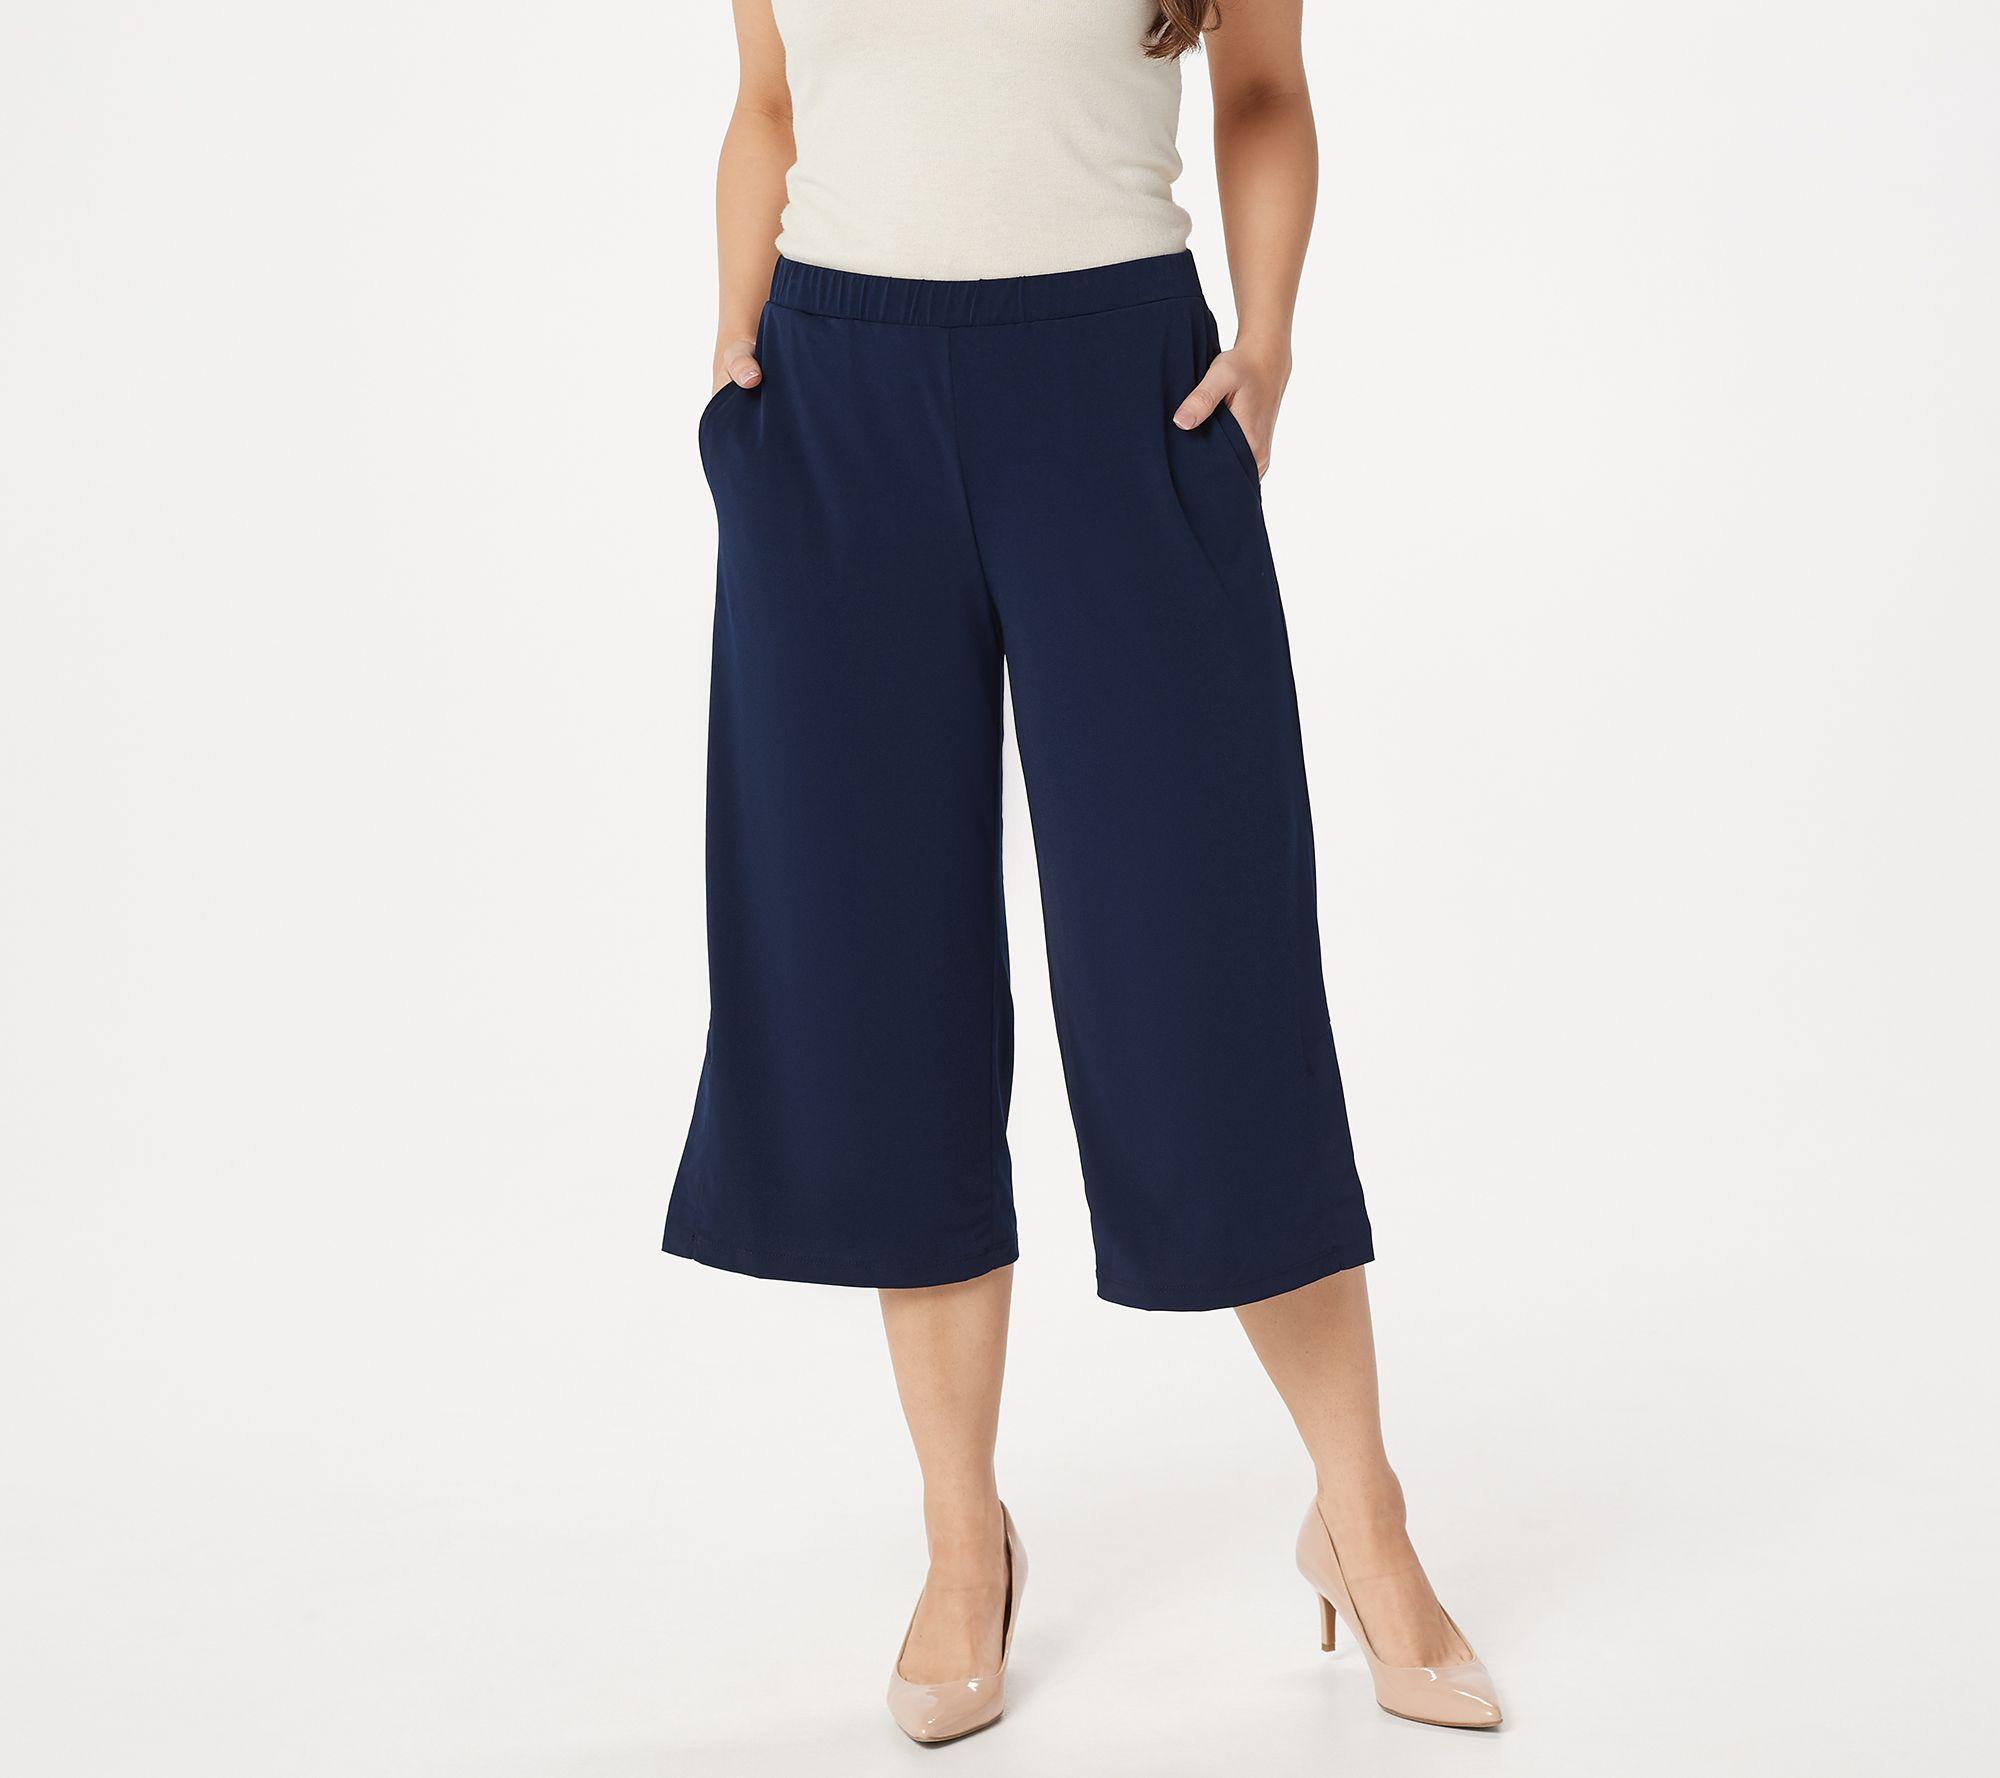 7f44f8170ab6 Susan Graver Liquid Knit Pull-On Wide Leg Crop Pants - Page 1 — QVC.com